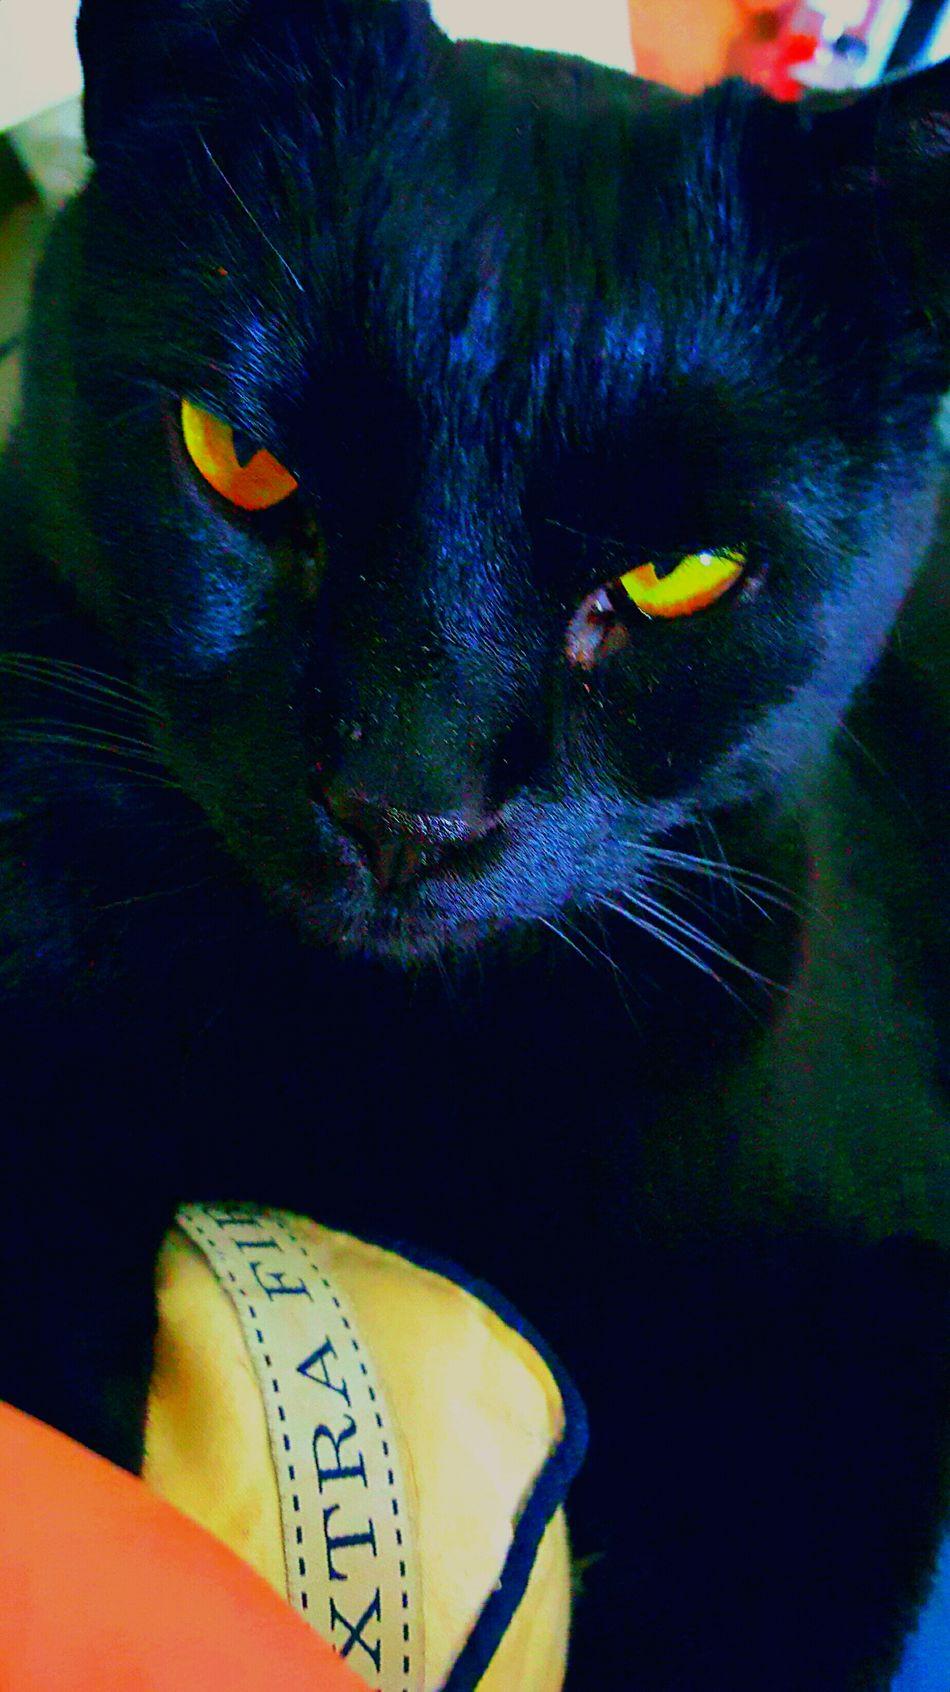 Mini Panther Bacardi Pets One Animal Animal Themes Domestic Animals Close-up Yellow Black Color Mammal Animal Body Part Yellow Eyes No People Animal Eye Indoors  Day